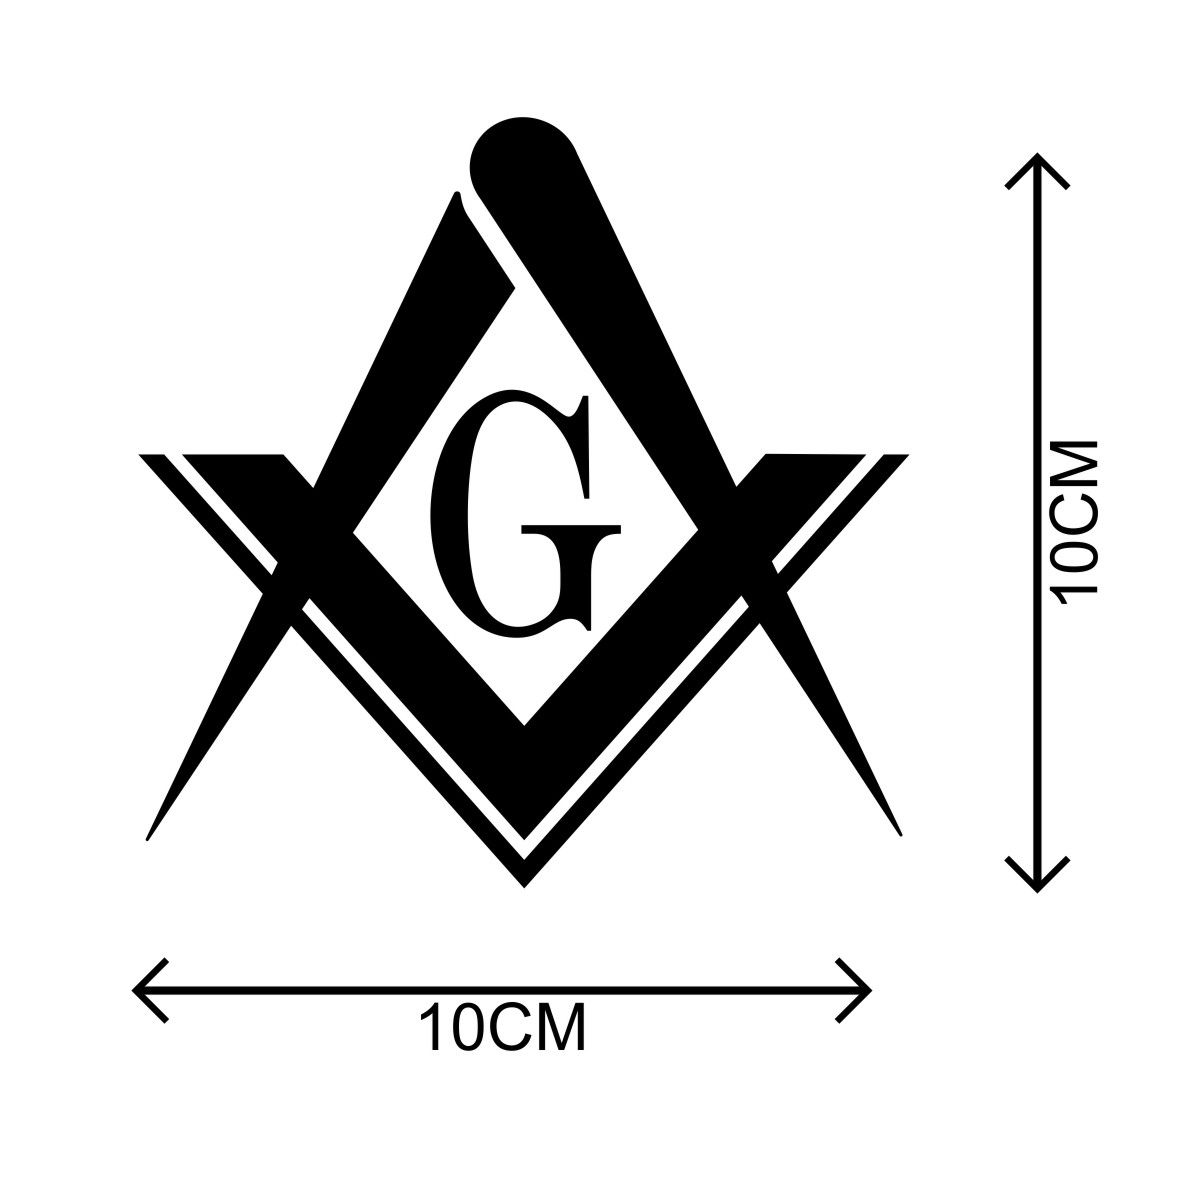 Adesivo Maçonaria - Kit com 3 unid. Tamanho G - 10x10cm